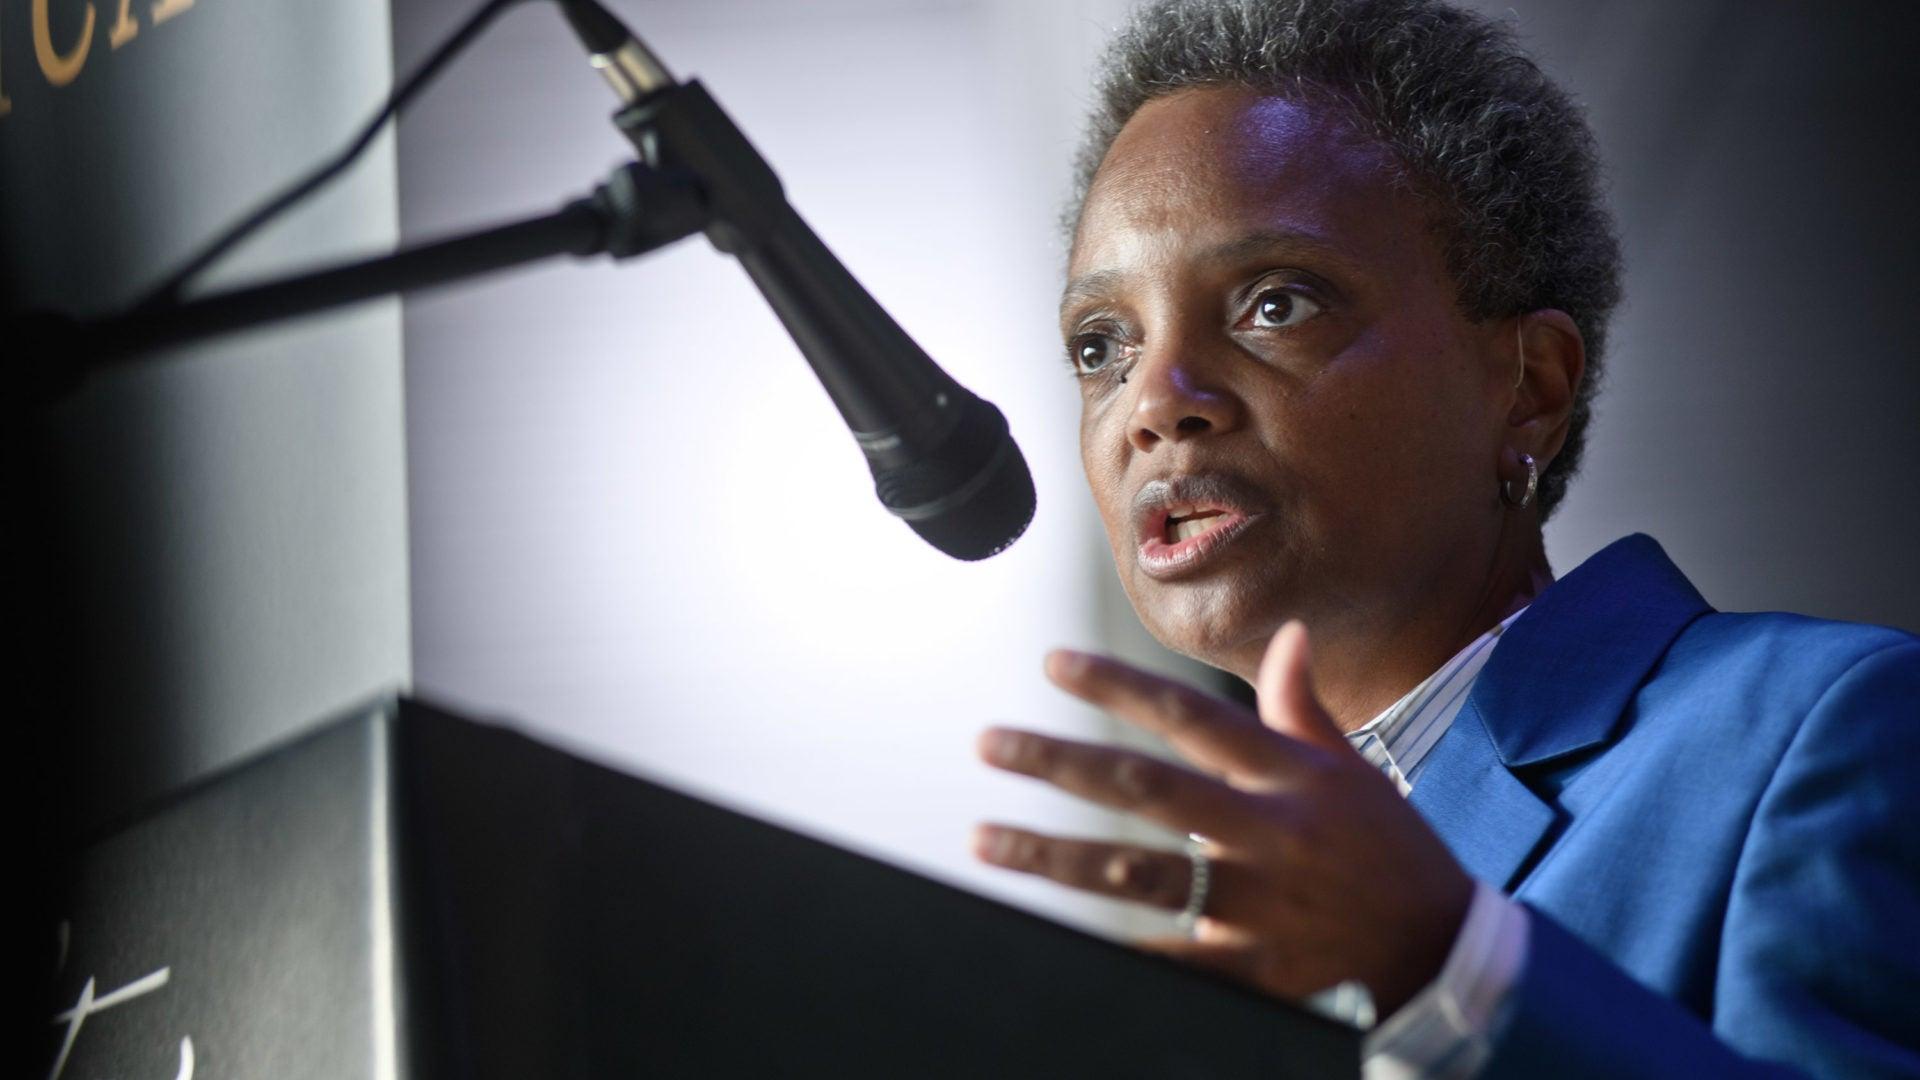 Chicago Mayor Lori Lightfoot Fires Police Chief Eddie Johnson